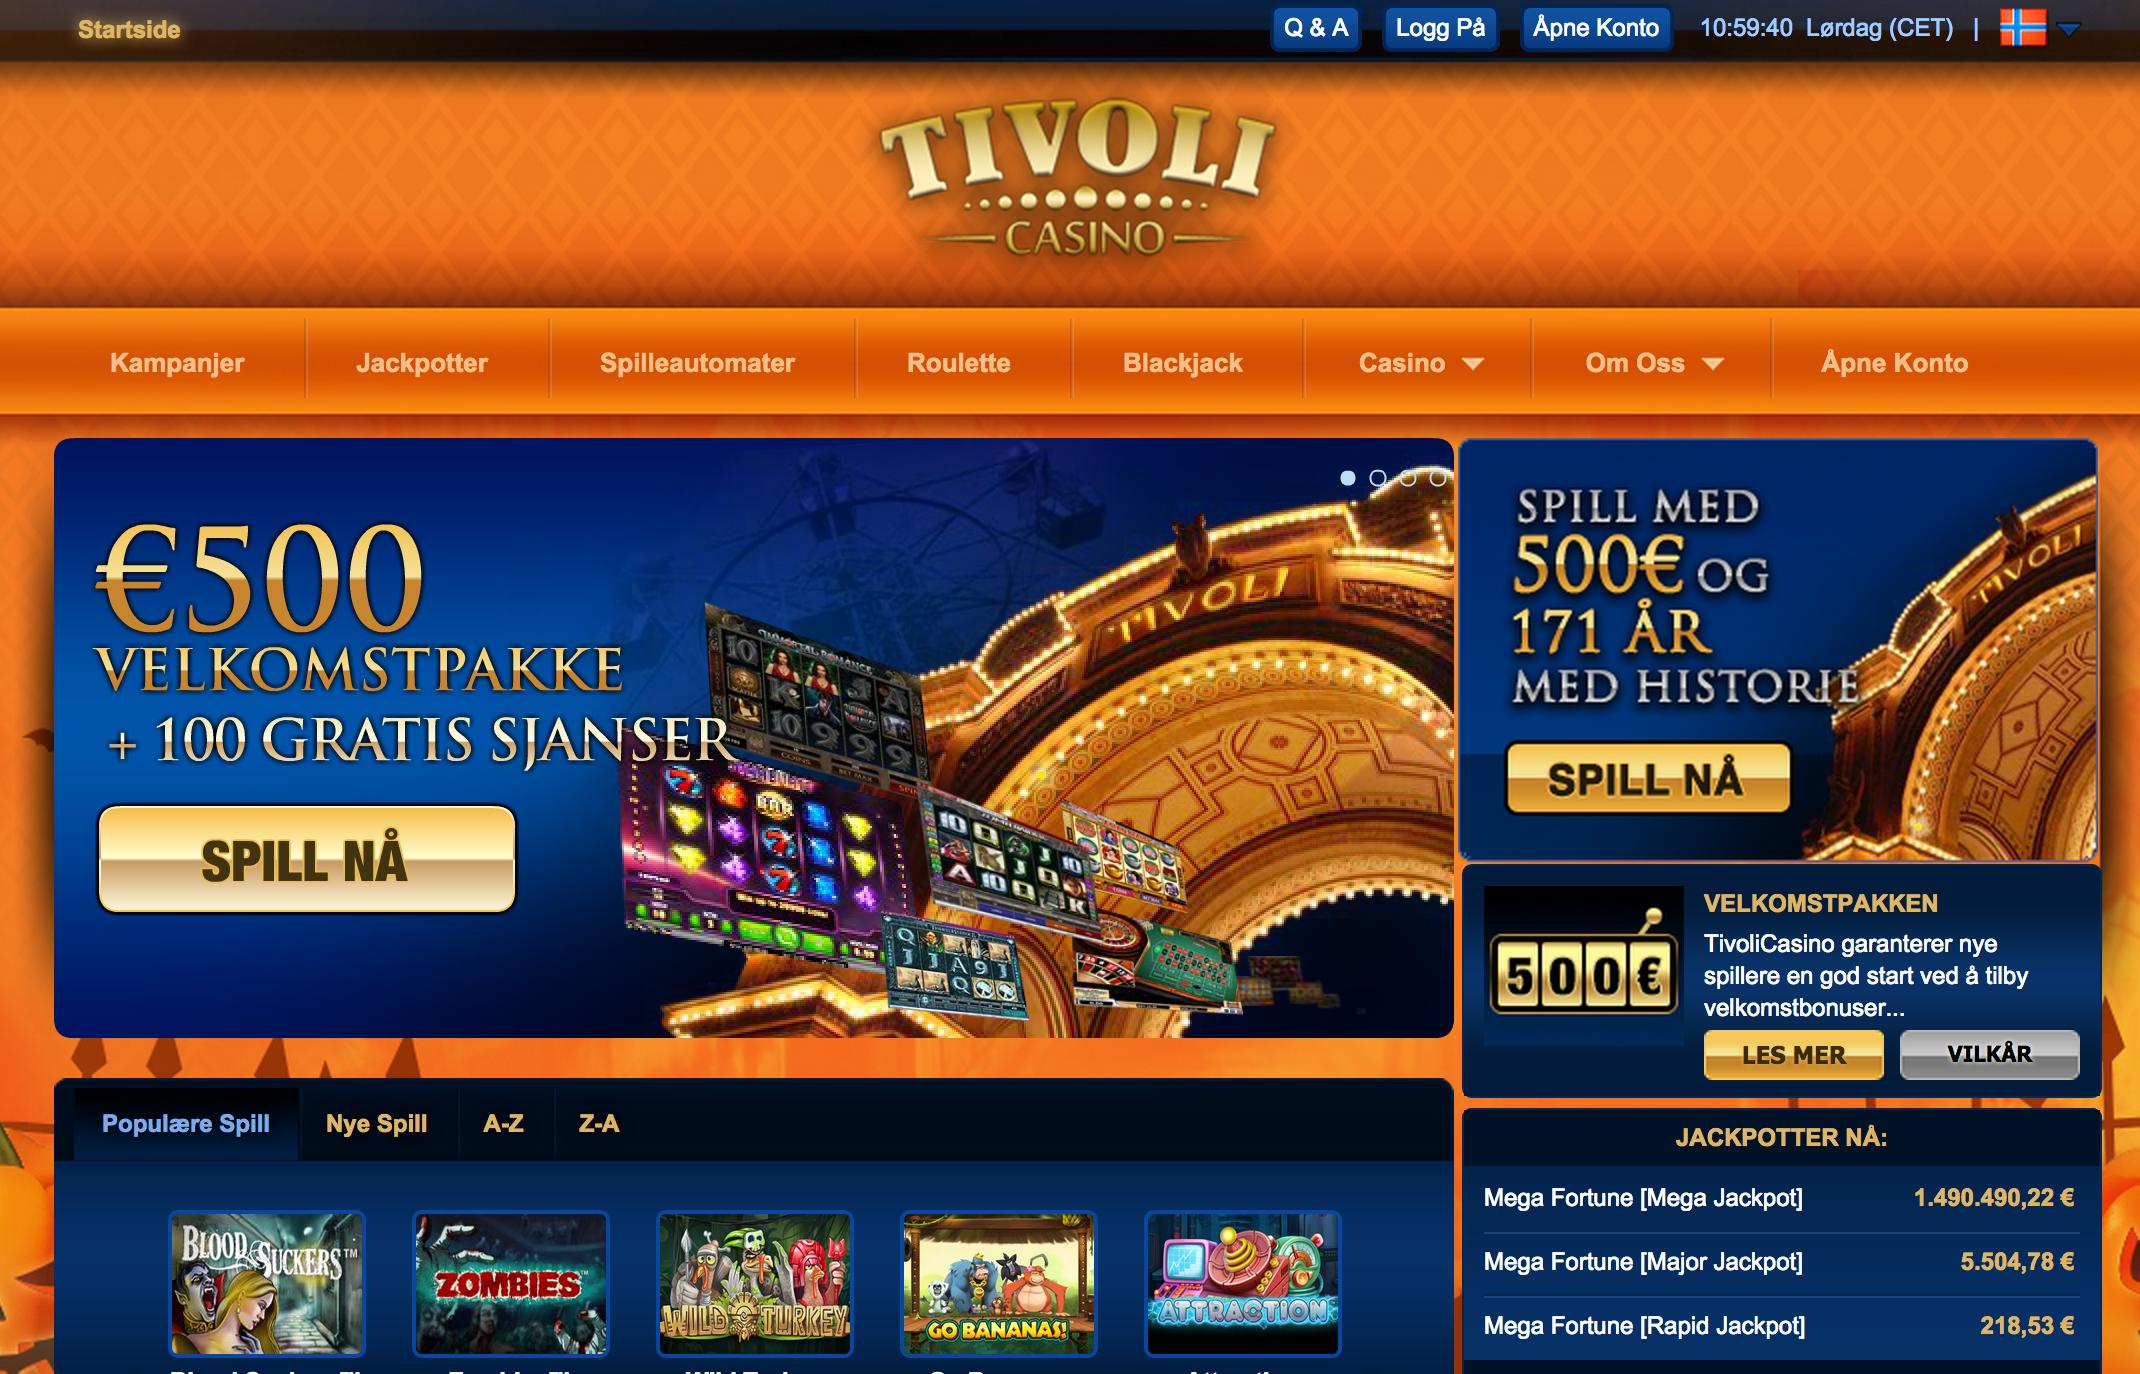 Tivoli Casino Velkomstbonus